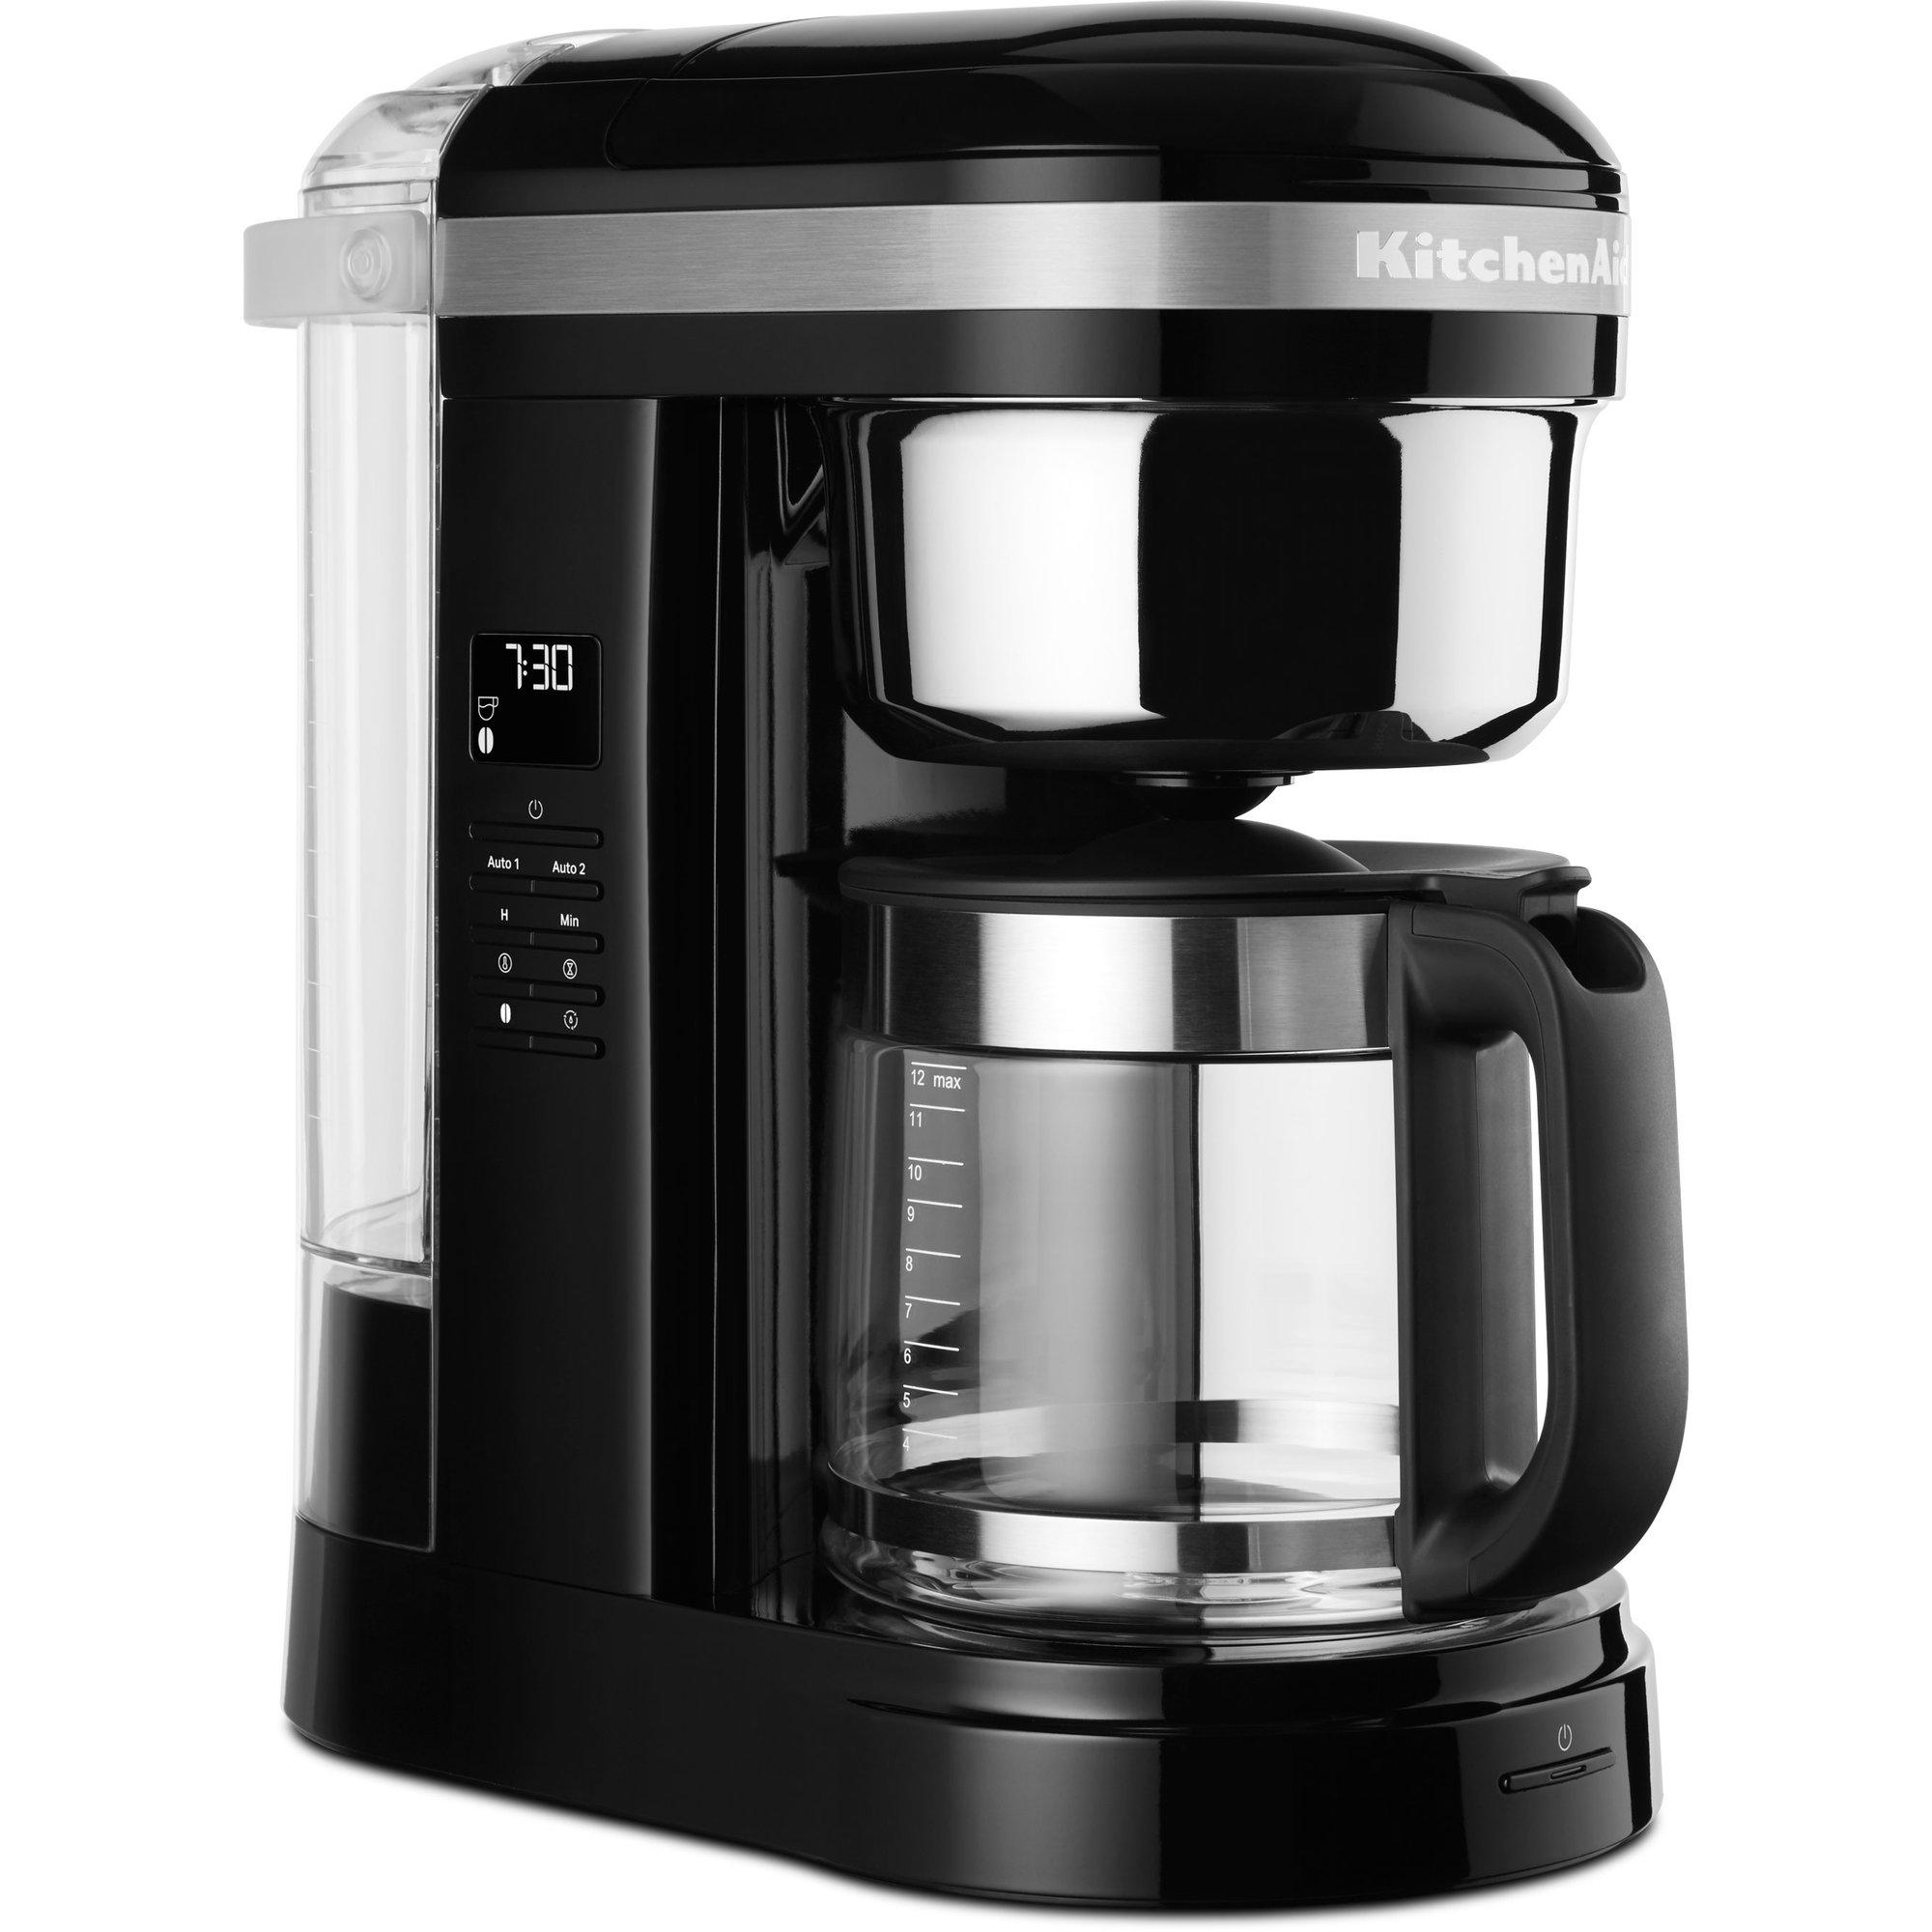 KitchenAid 5KCM1209EOB Kaffebryggare Onyx Black